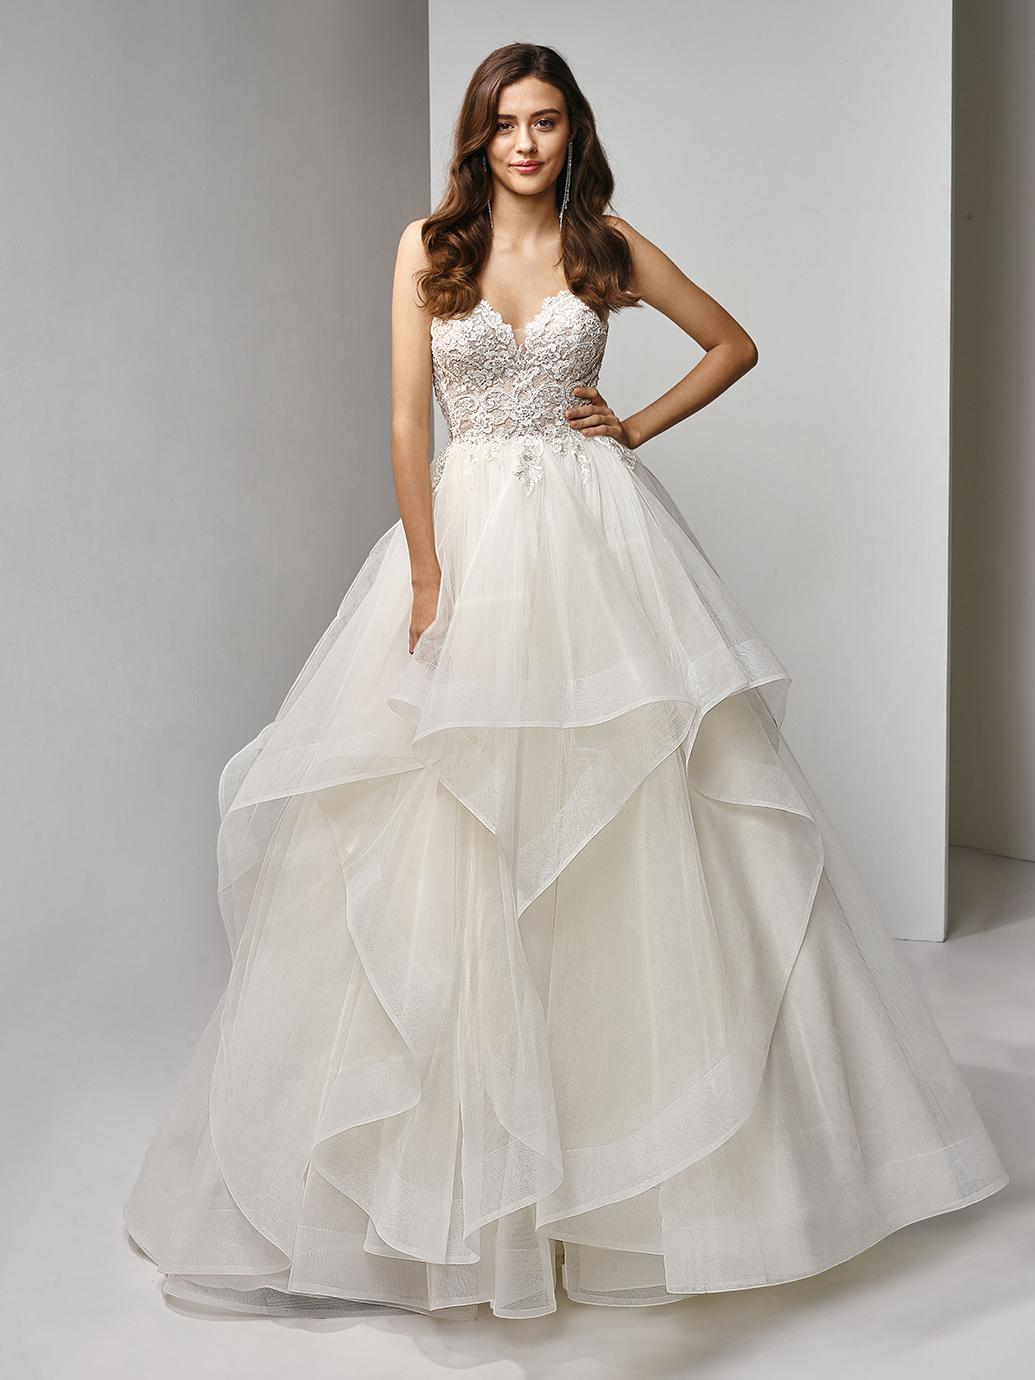 Enzoani Beautiful Wedding Dress BT19-09 BT19-9 Strapless wedding dress romantic wedding dress layered wedding dress